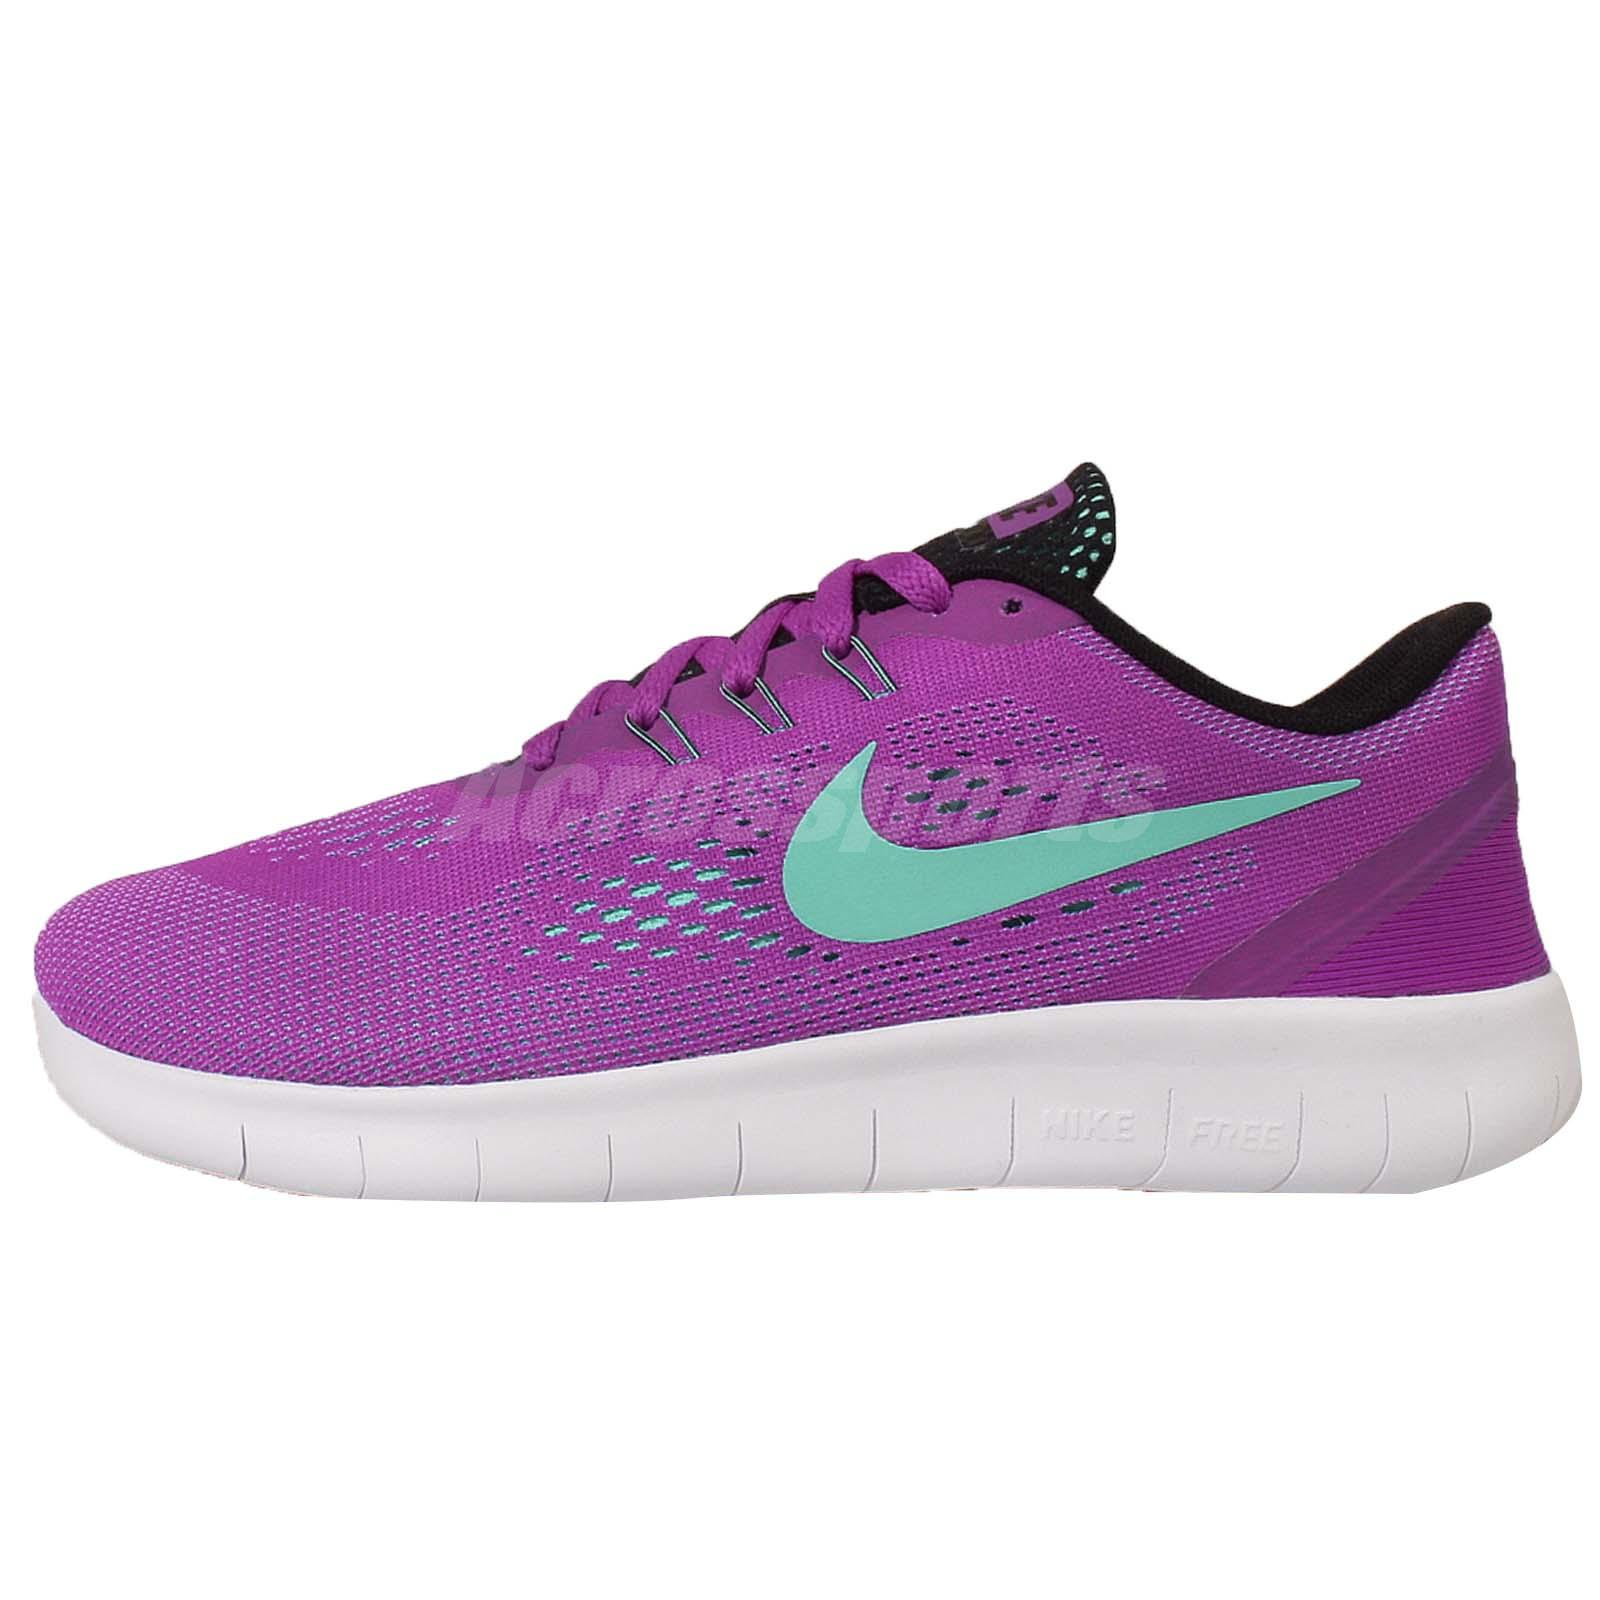 purple nike running shoes for girls. n i k e free rn gs run purple blue kids youth girls running shoes 833993-500 nike for t